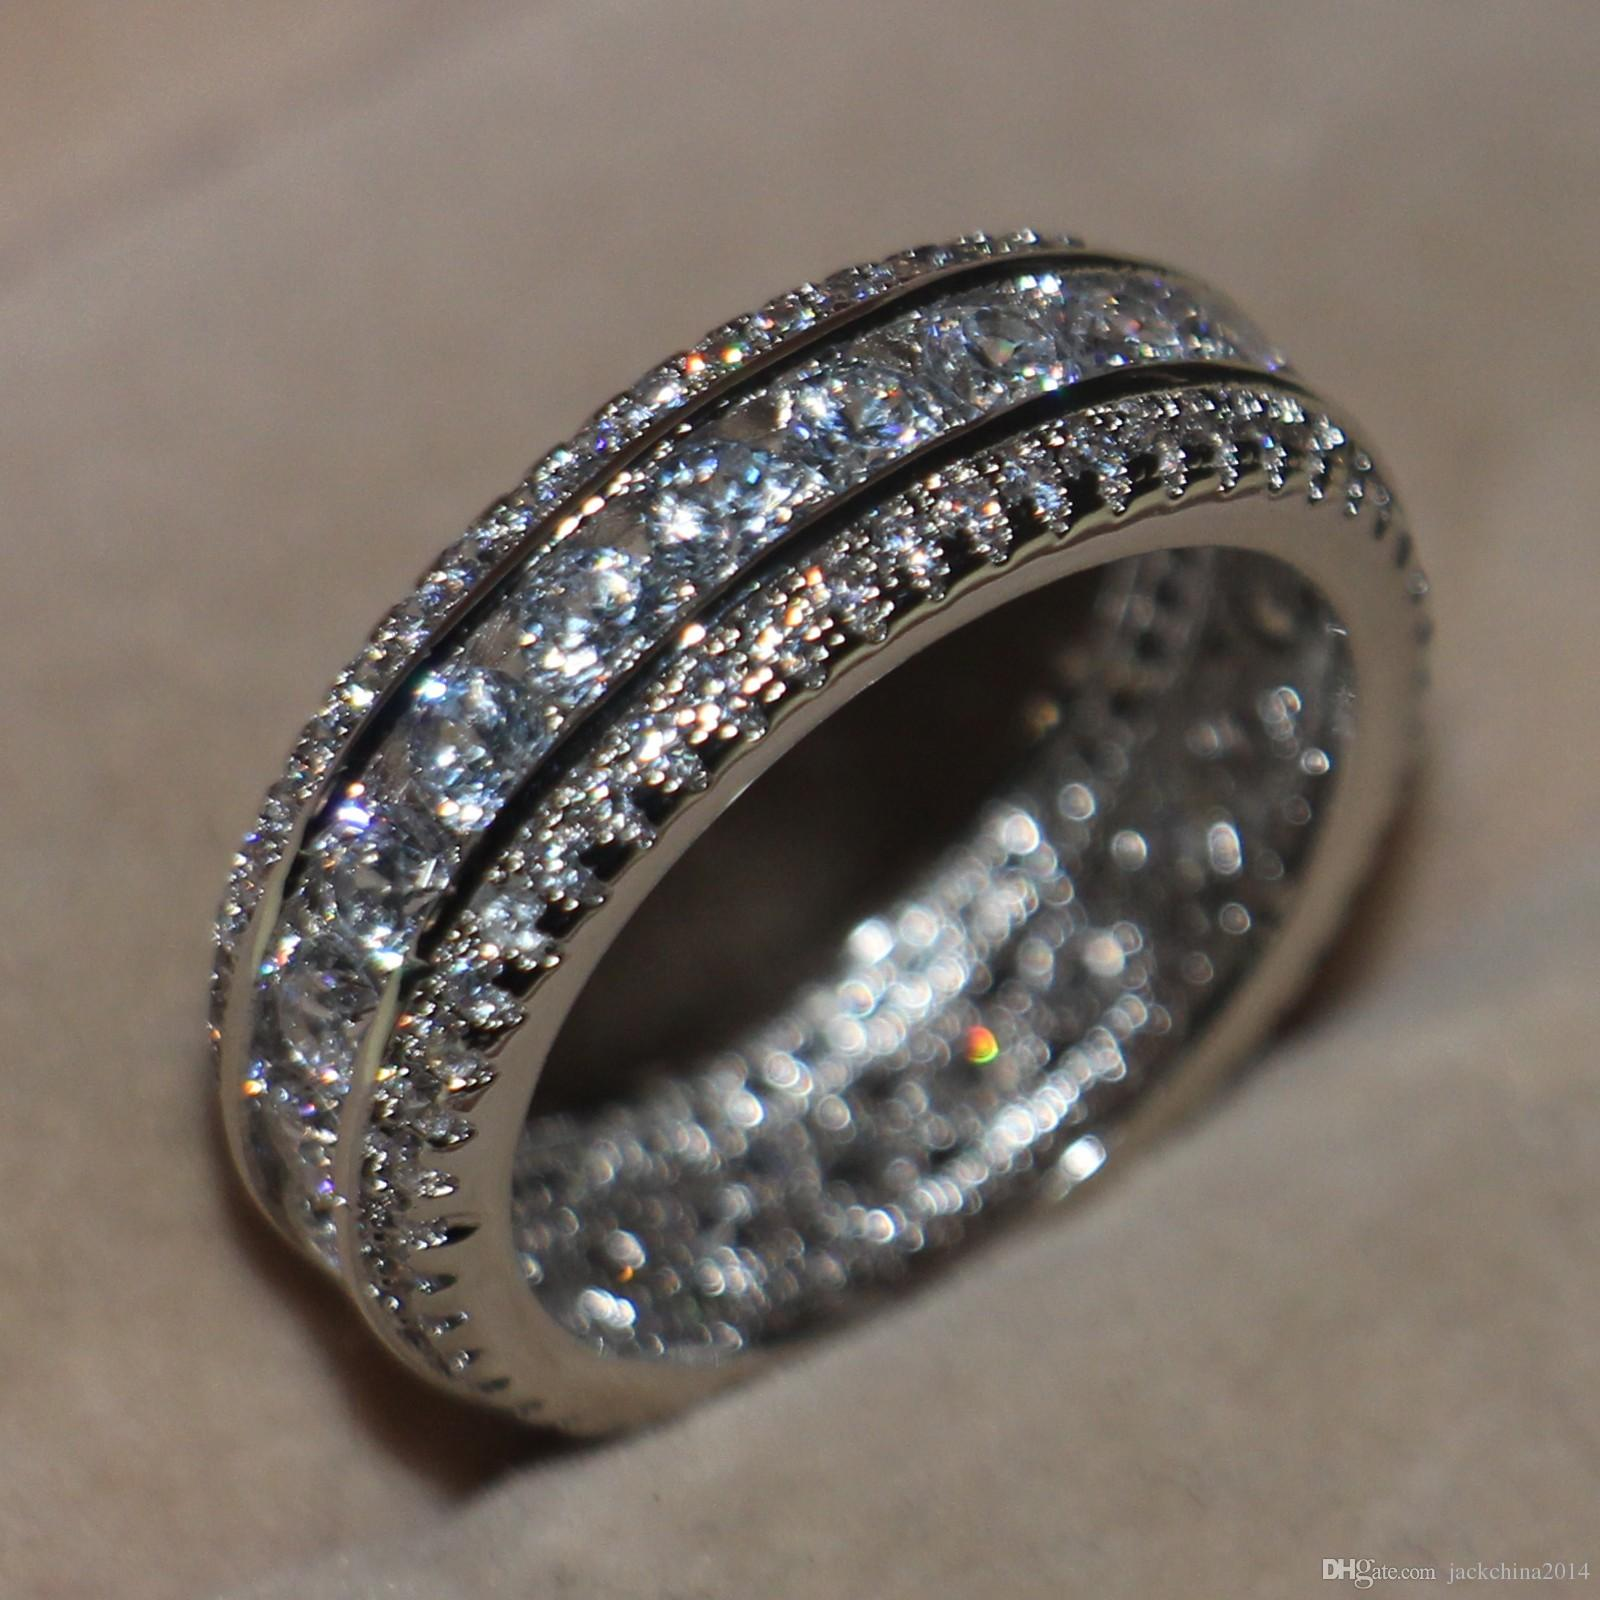 Atemberaubende 2016 Neue Ankunft Luxus Jewelly Rundschnitt 925 Sterling Silber Simulierte Diamant Gemstons Pflastern Frauen Engagement Kreis Ring Size5-11